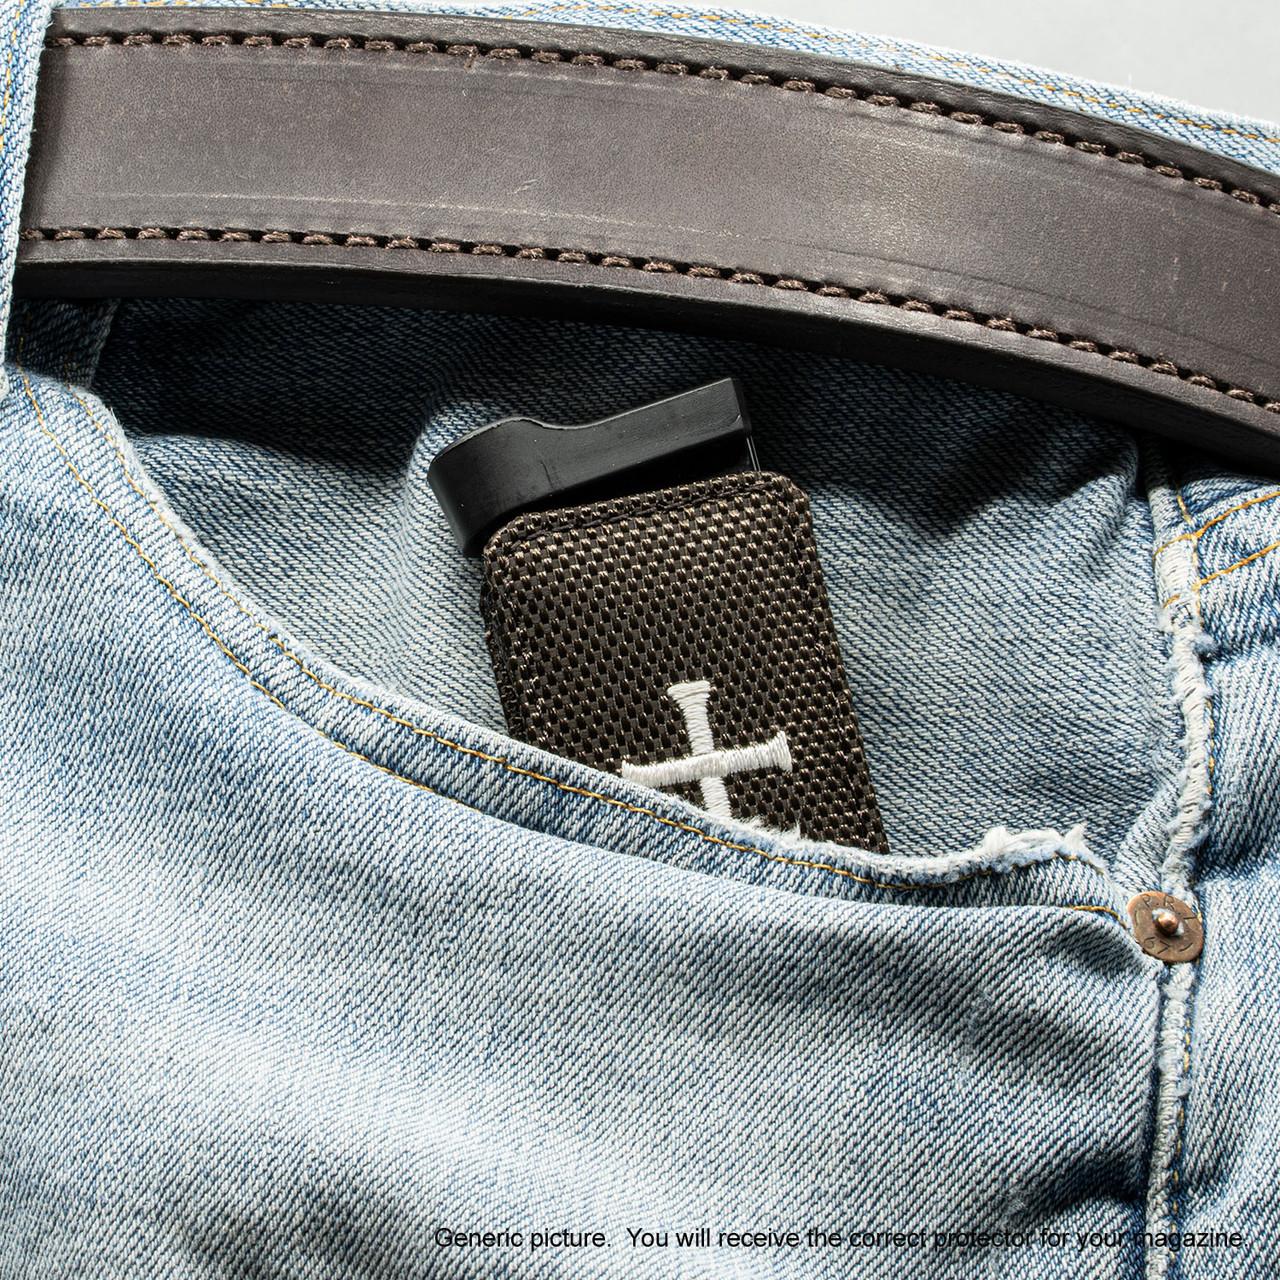 Kahr CW45 Brown Nylon Cross Magazine Pocket Protector